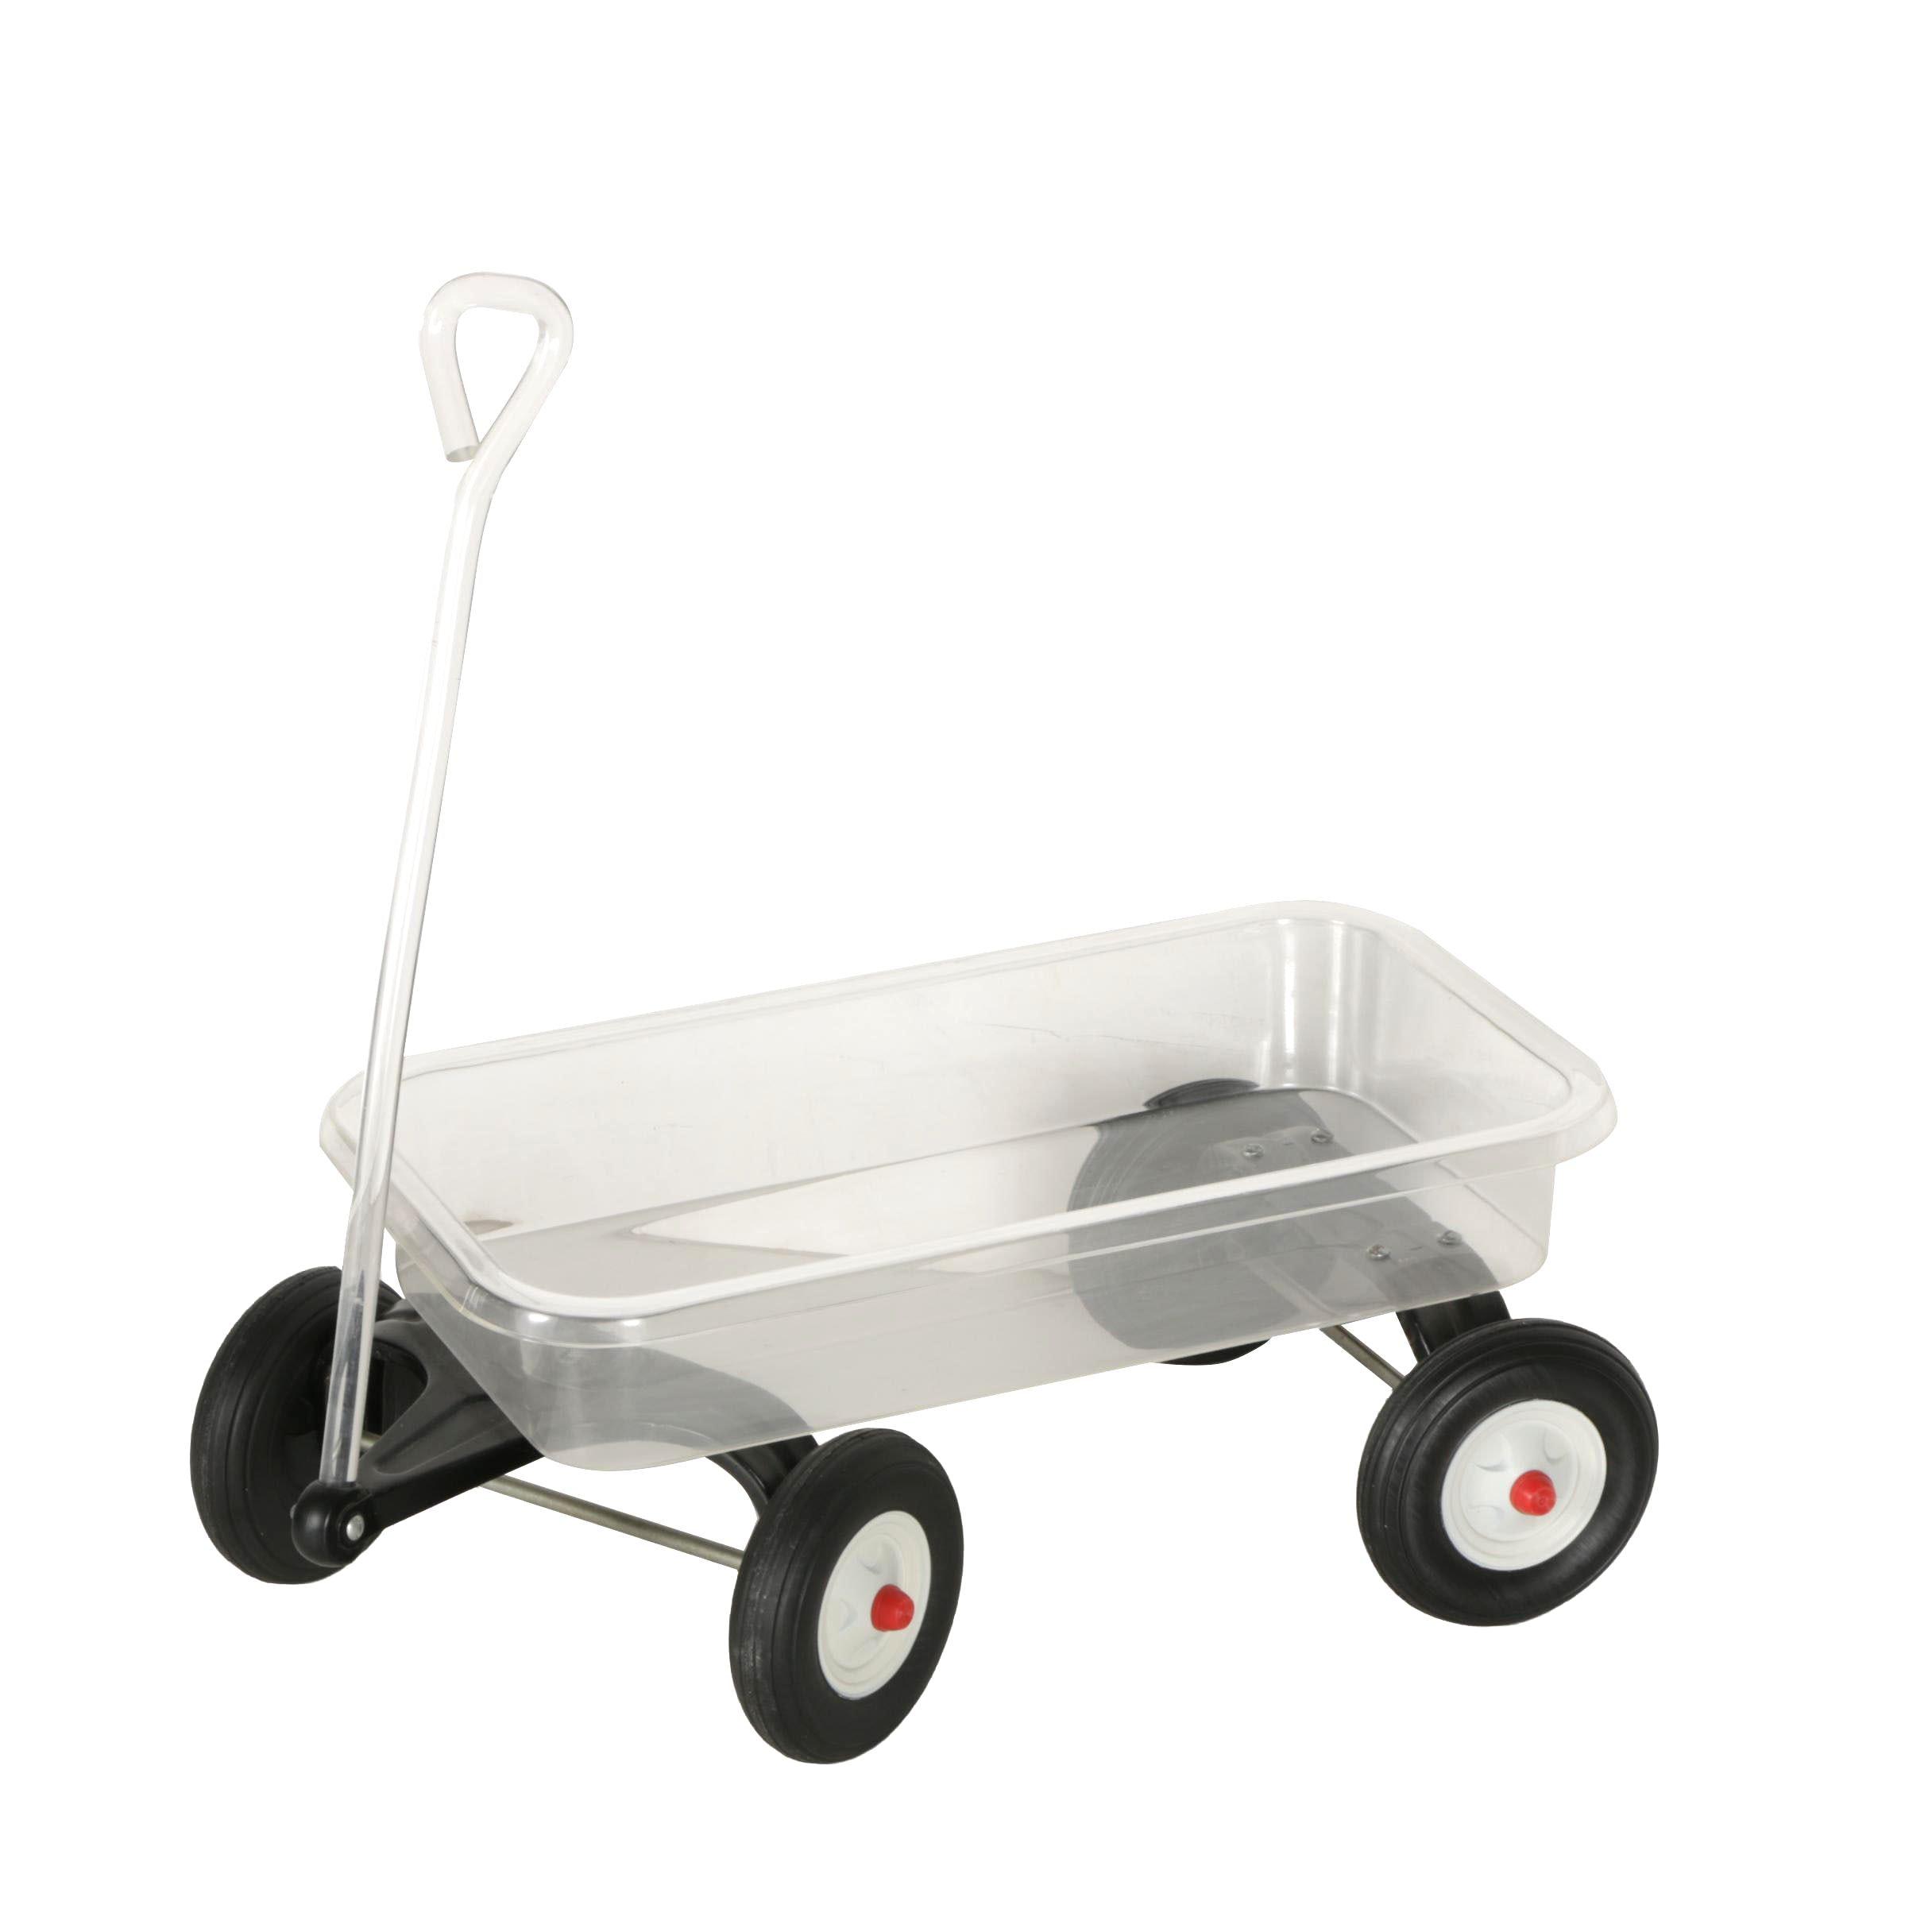 Clear Acrylic Wagon